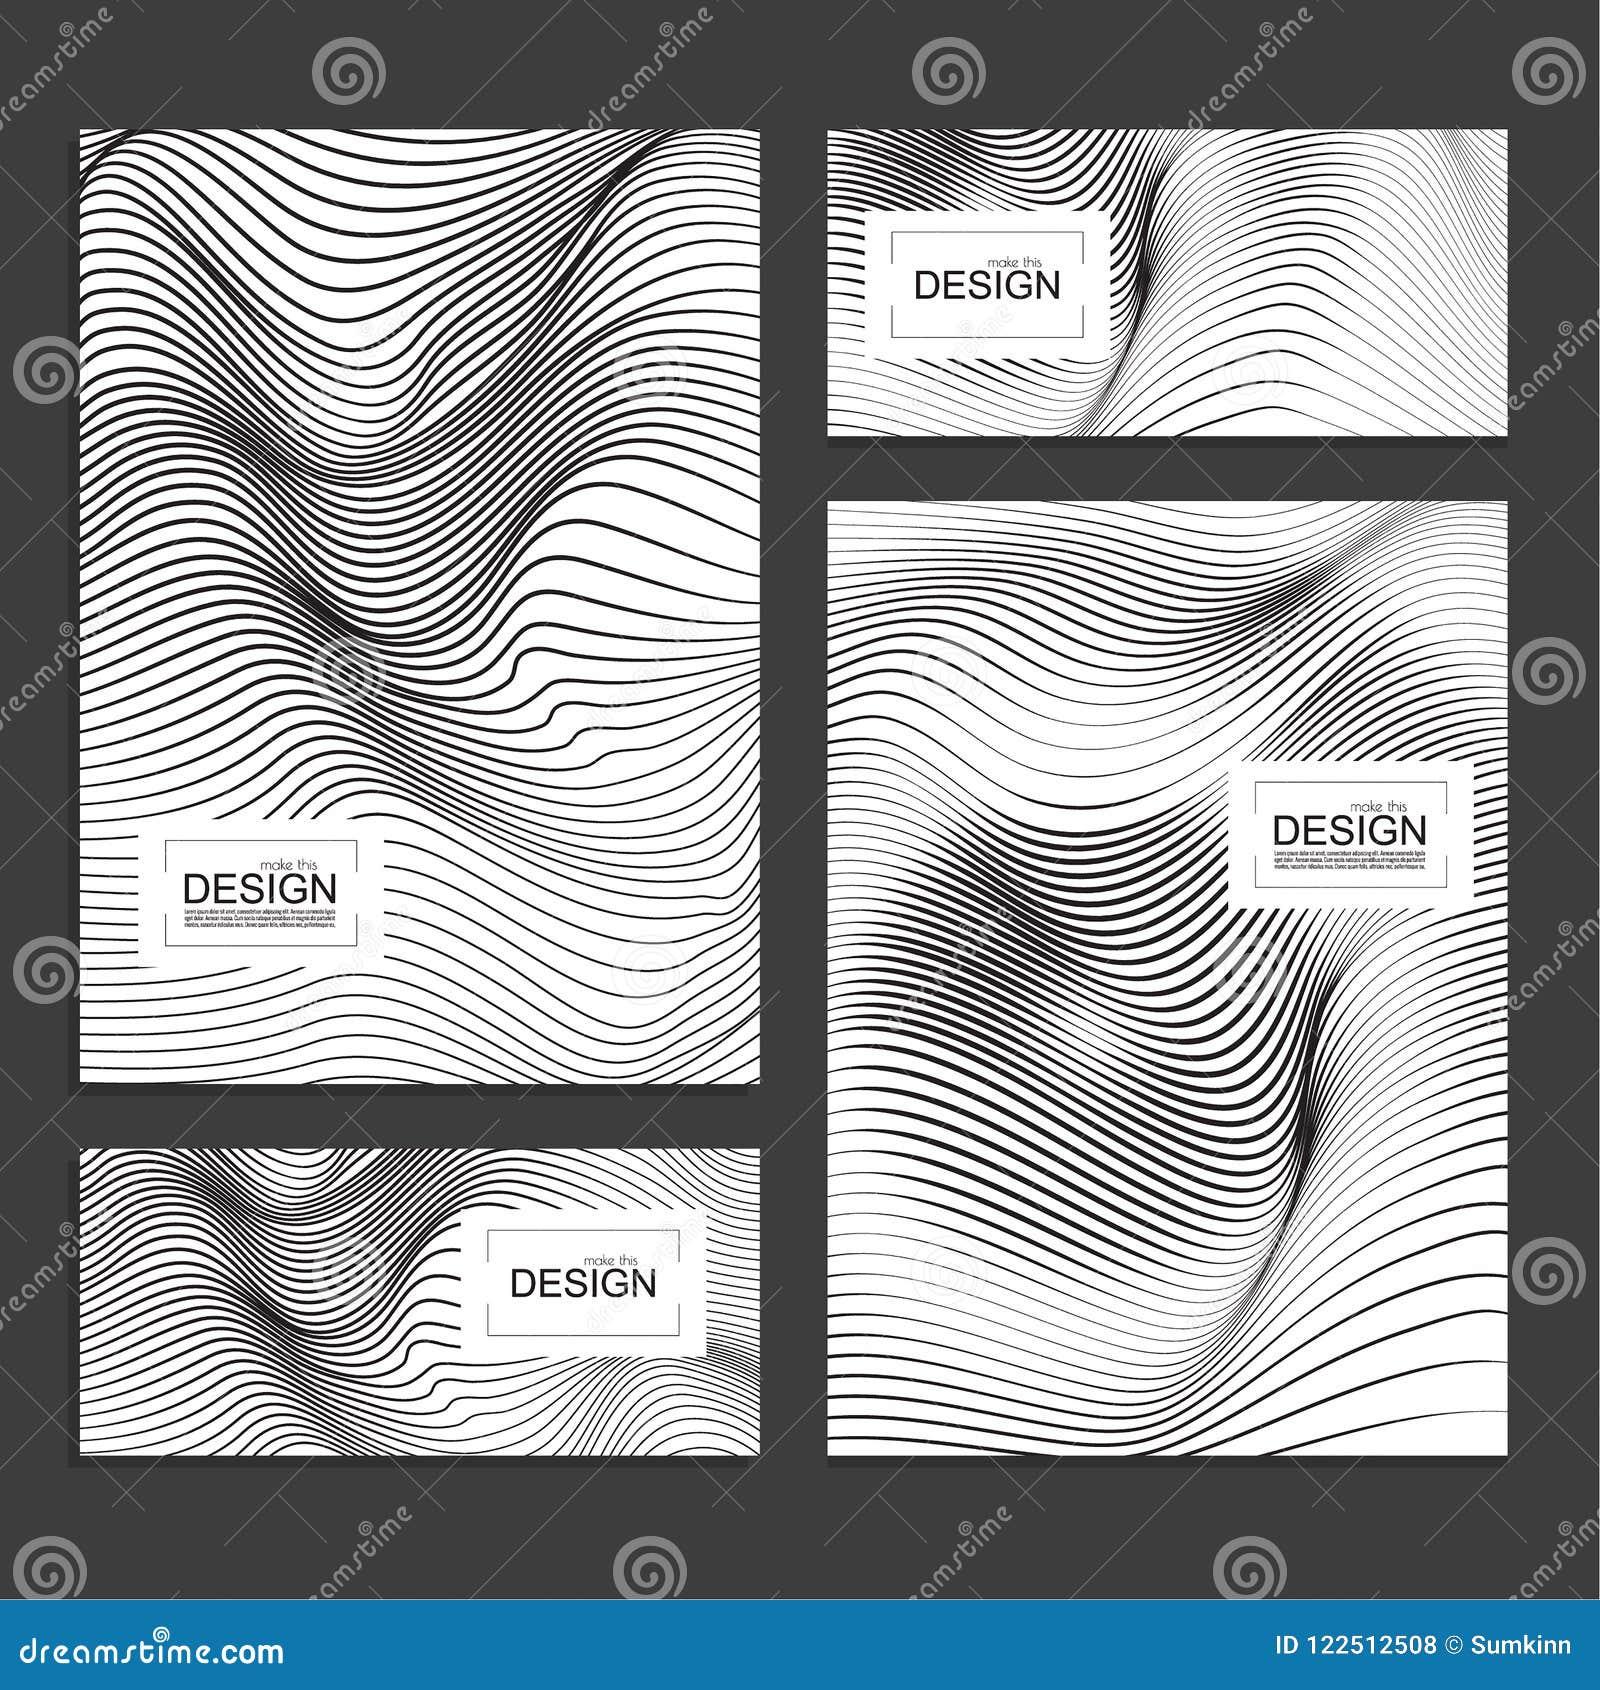 black texture background.html